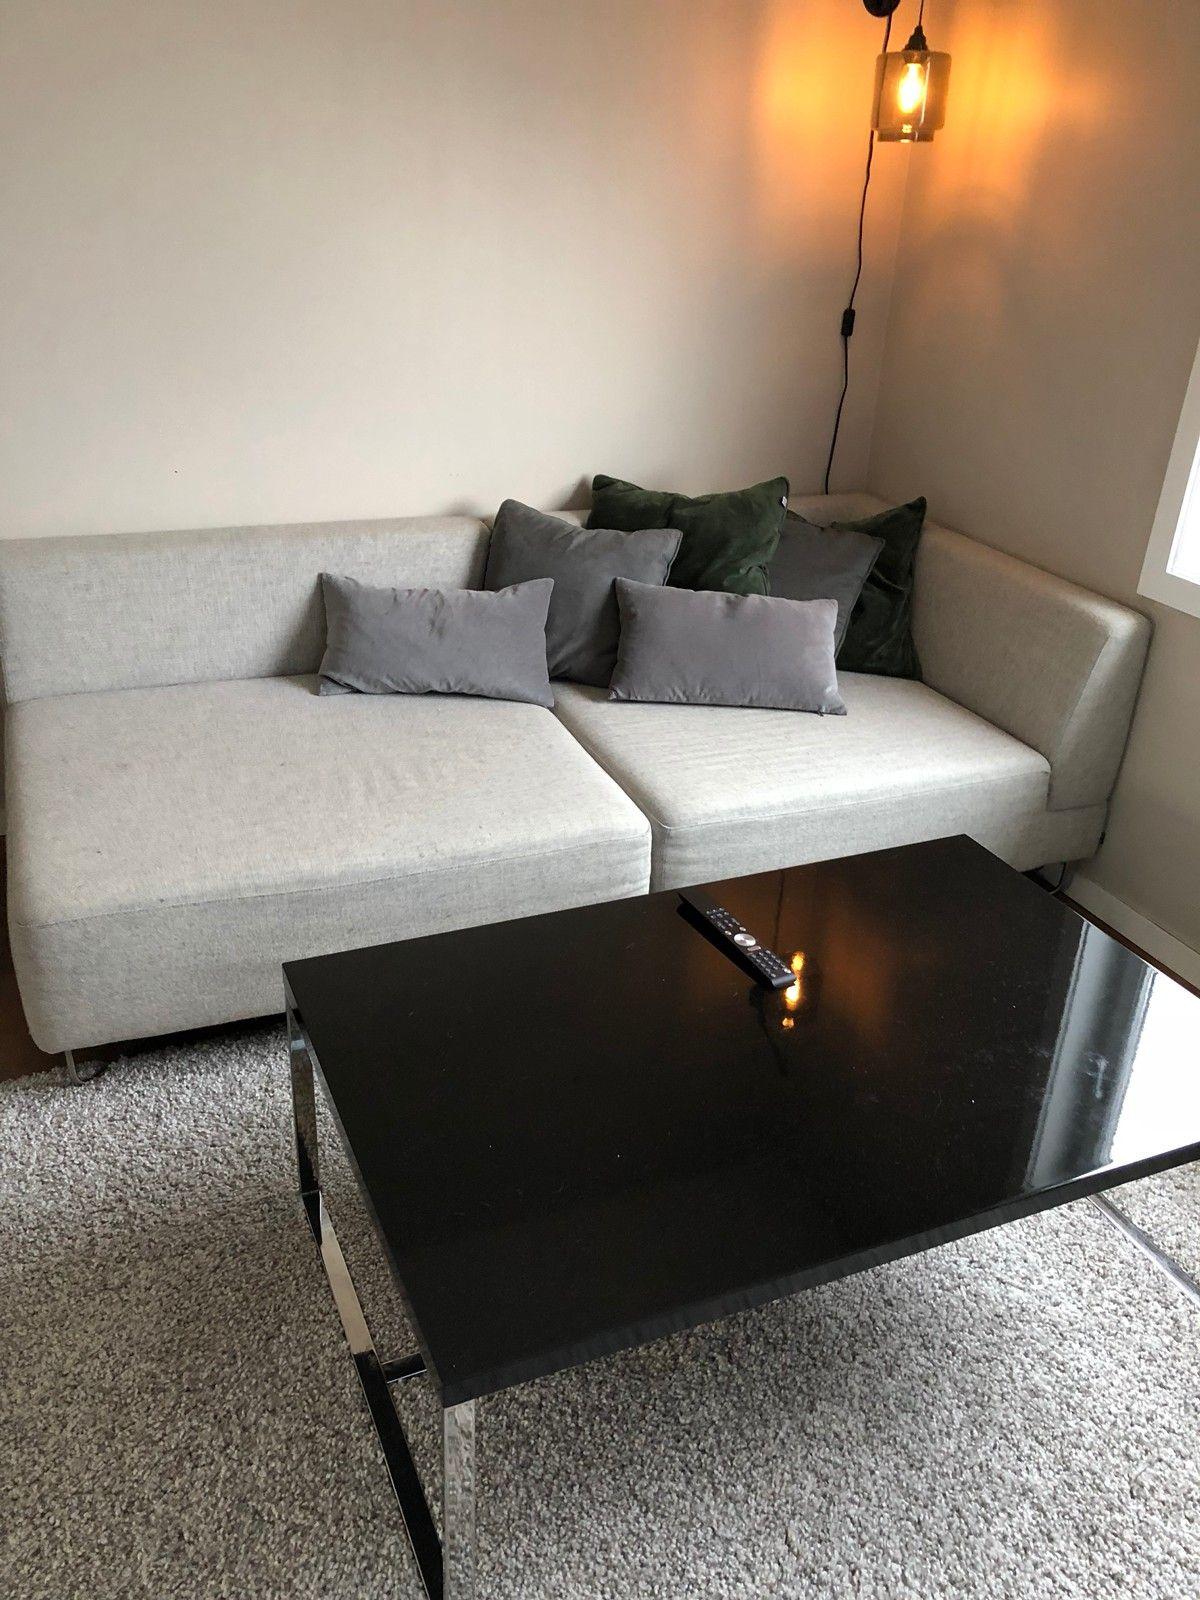 Modul Sofa Hjort Knudsen Multibyg Modul Sofa With Modul Sofa